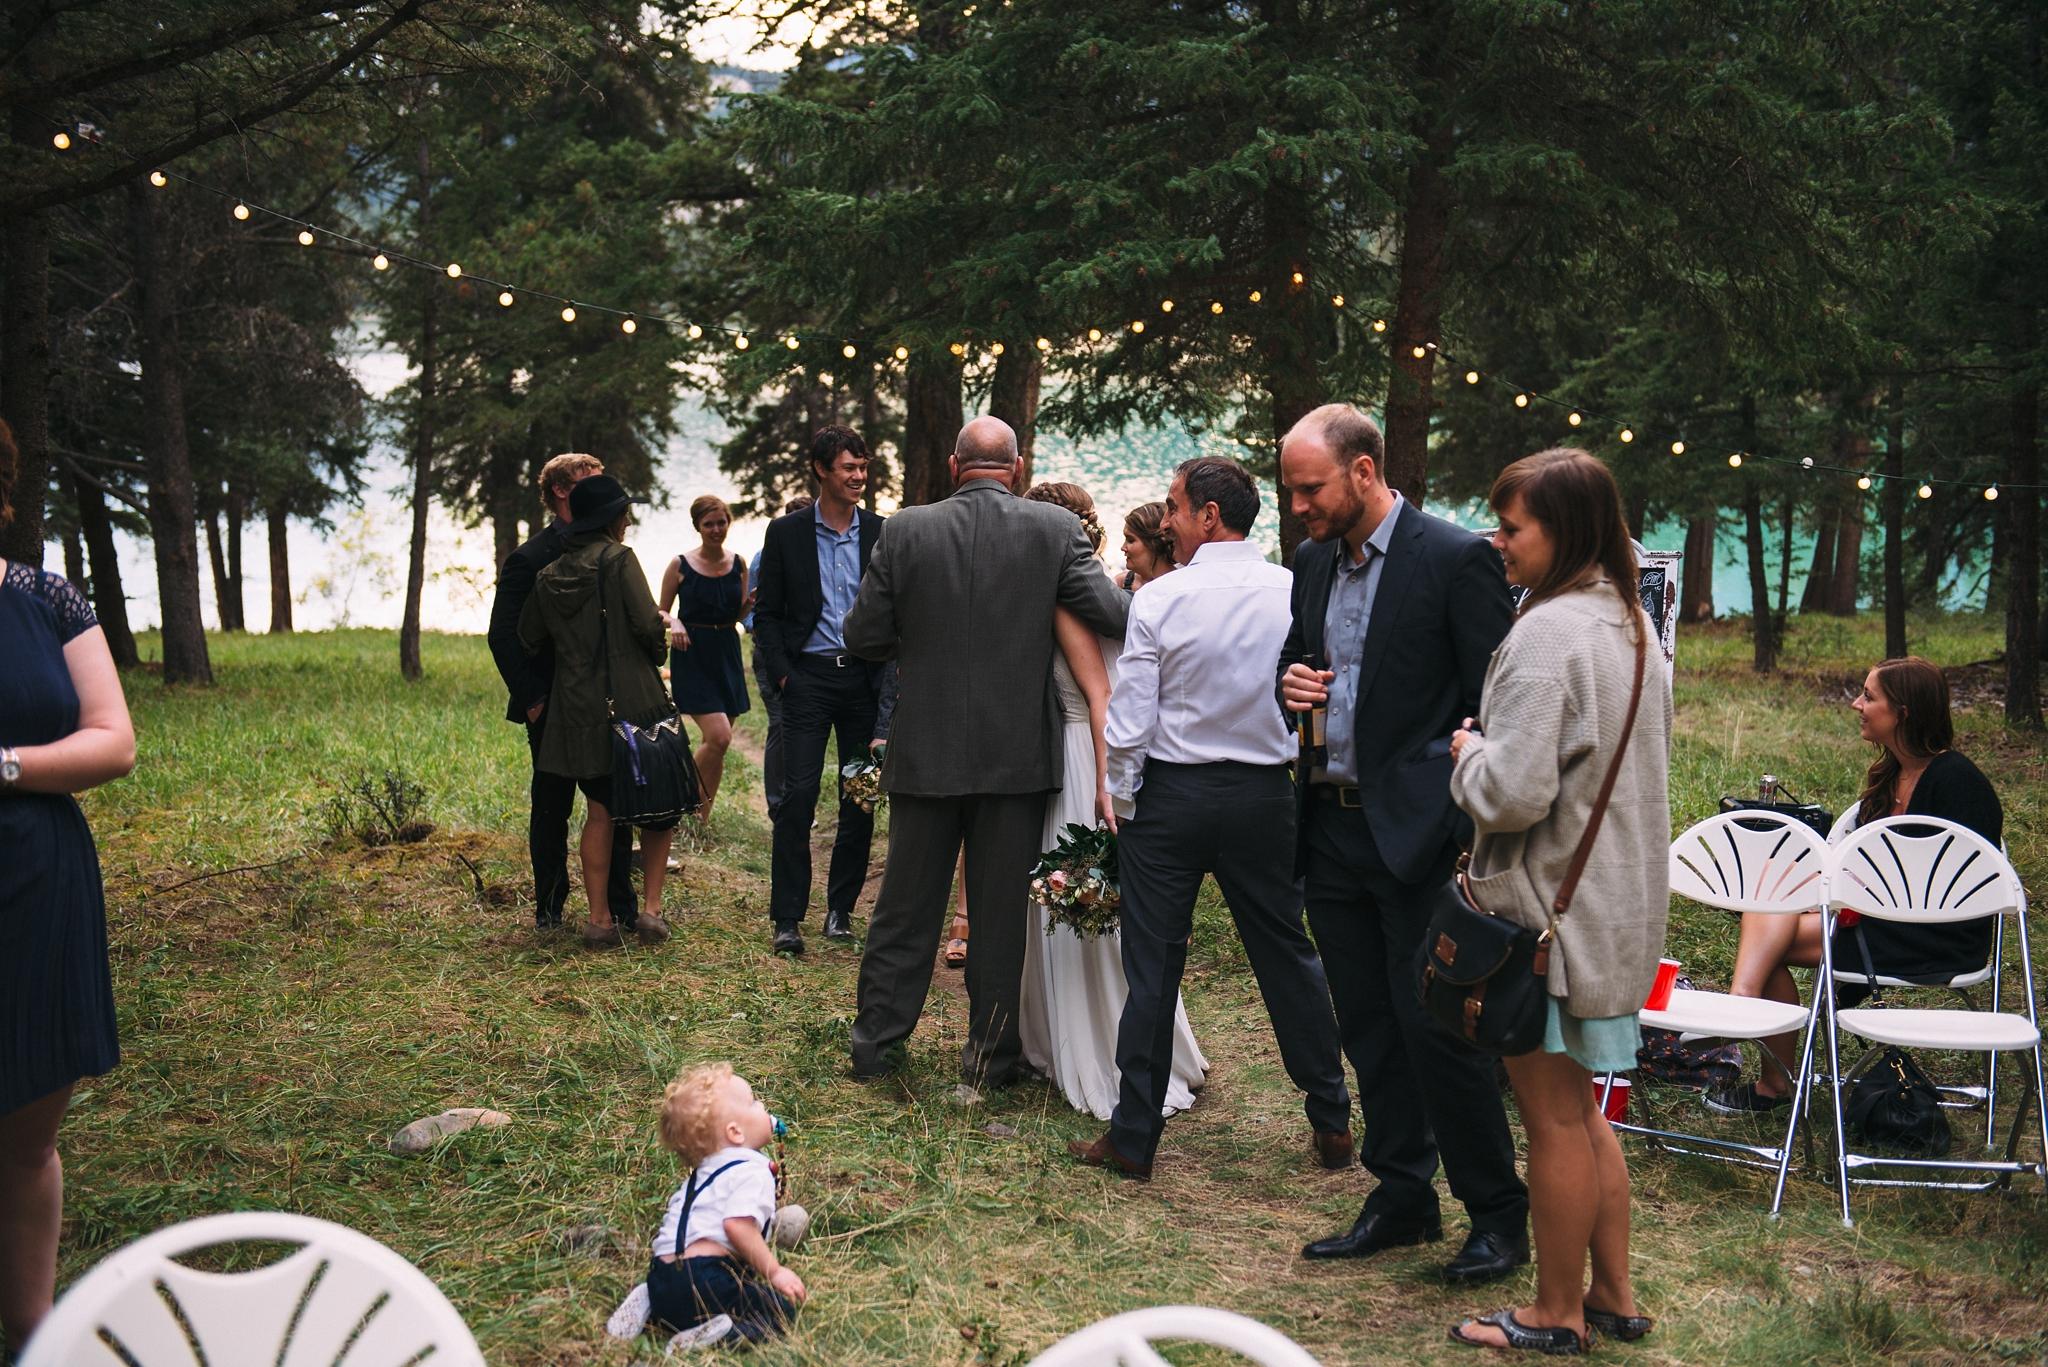 kaihla_tonai_intimate_wedding_elopement_photographer_2545